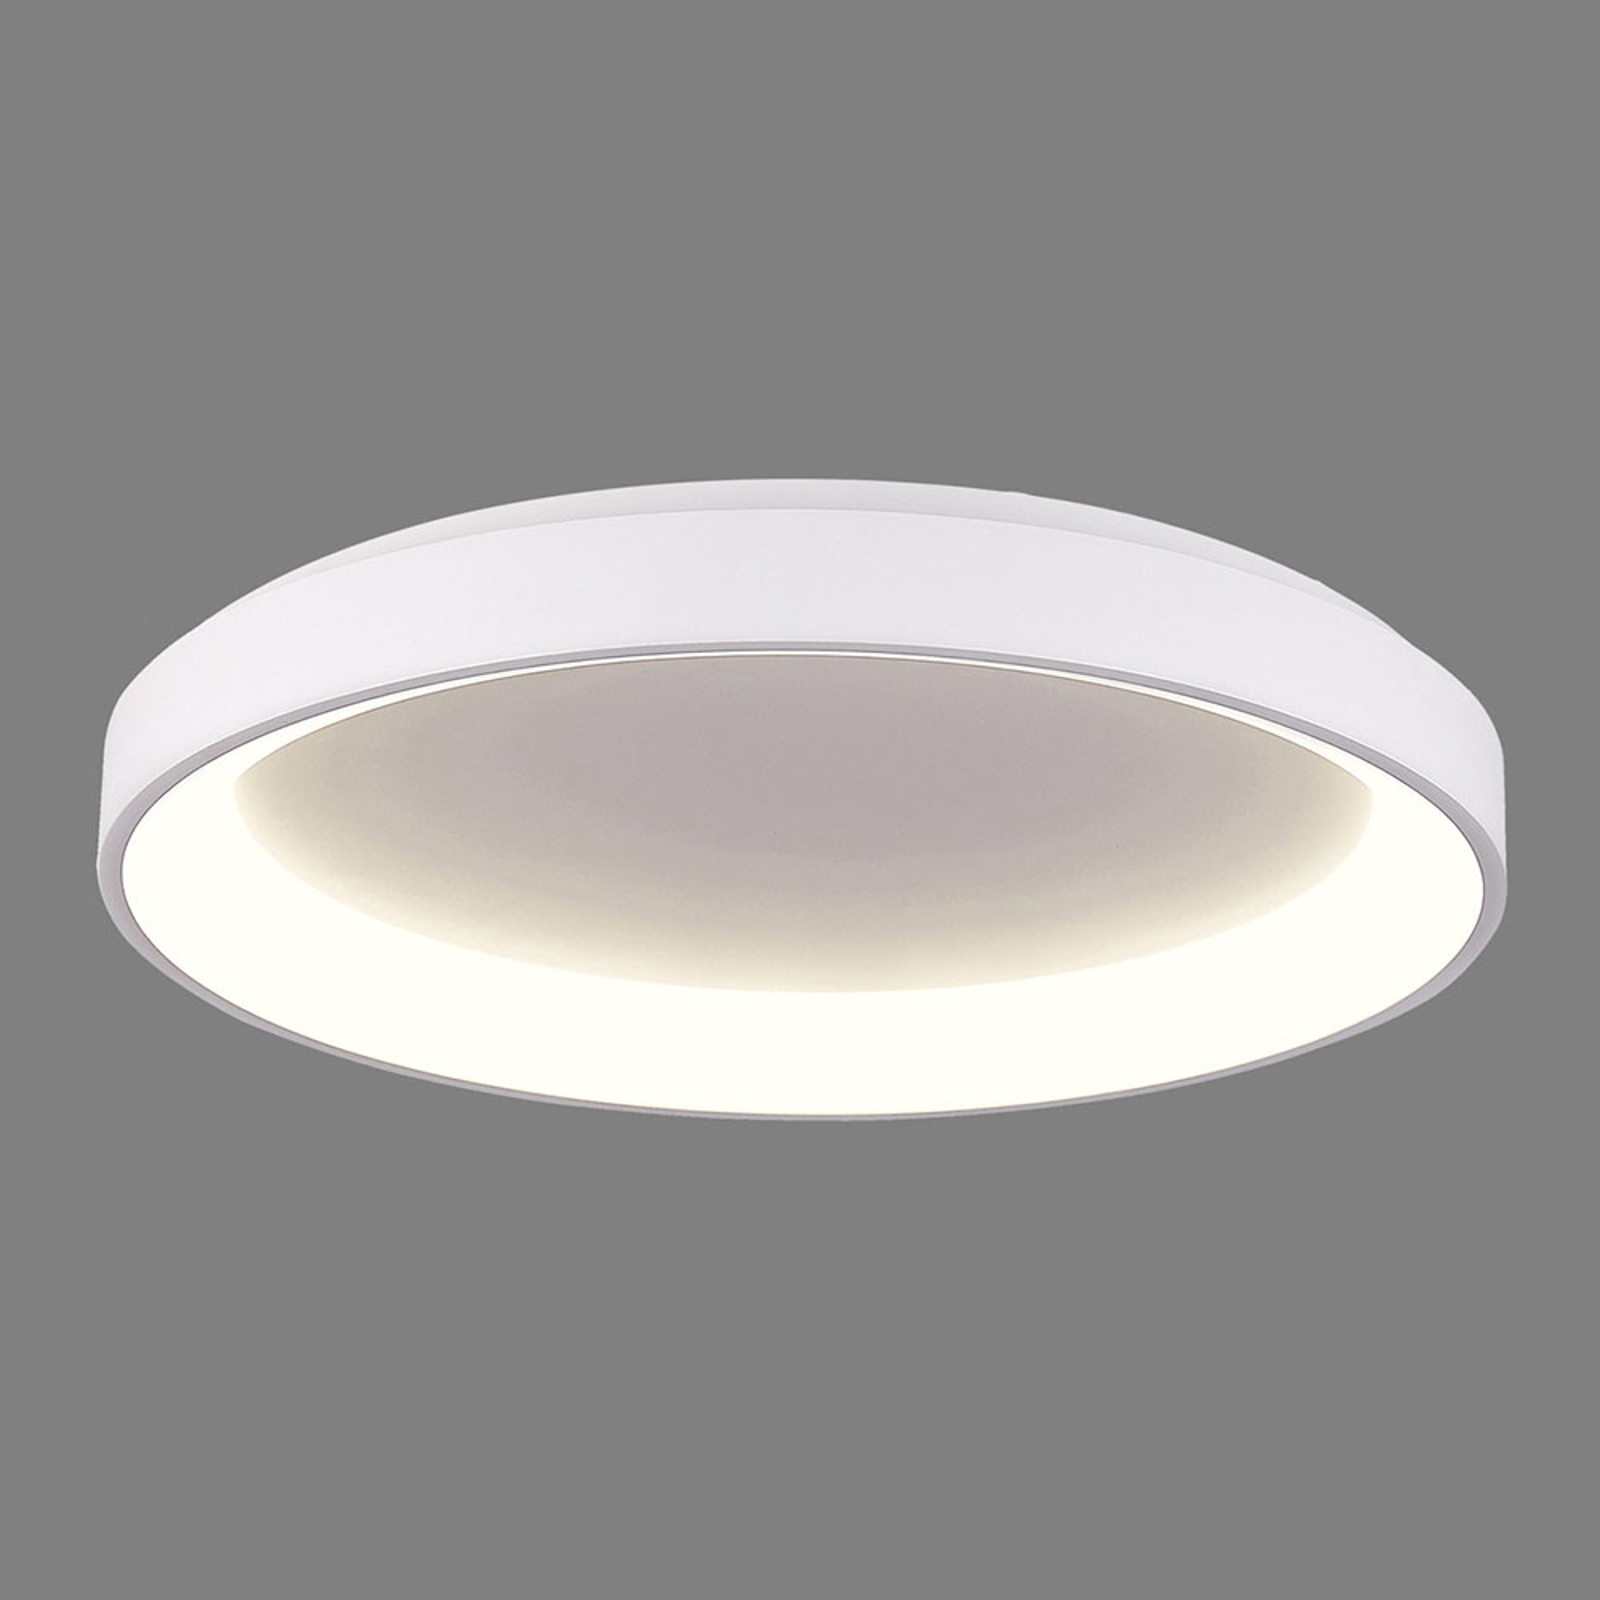 LED-taklampe Grace, DALI, Ø 58 cm, Casambi